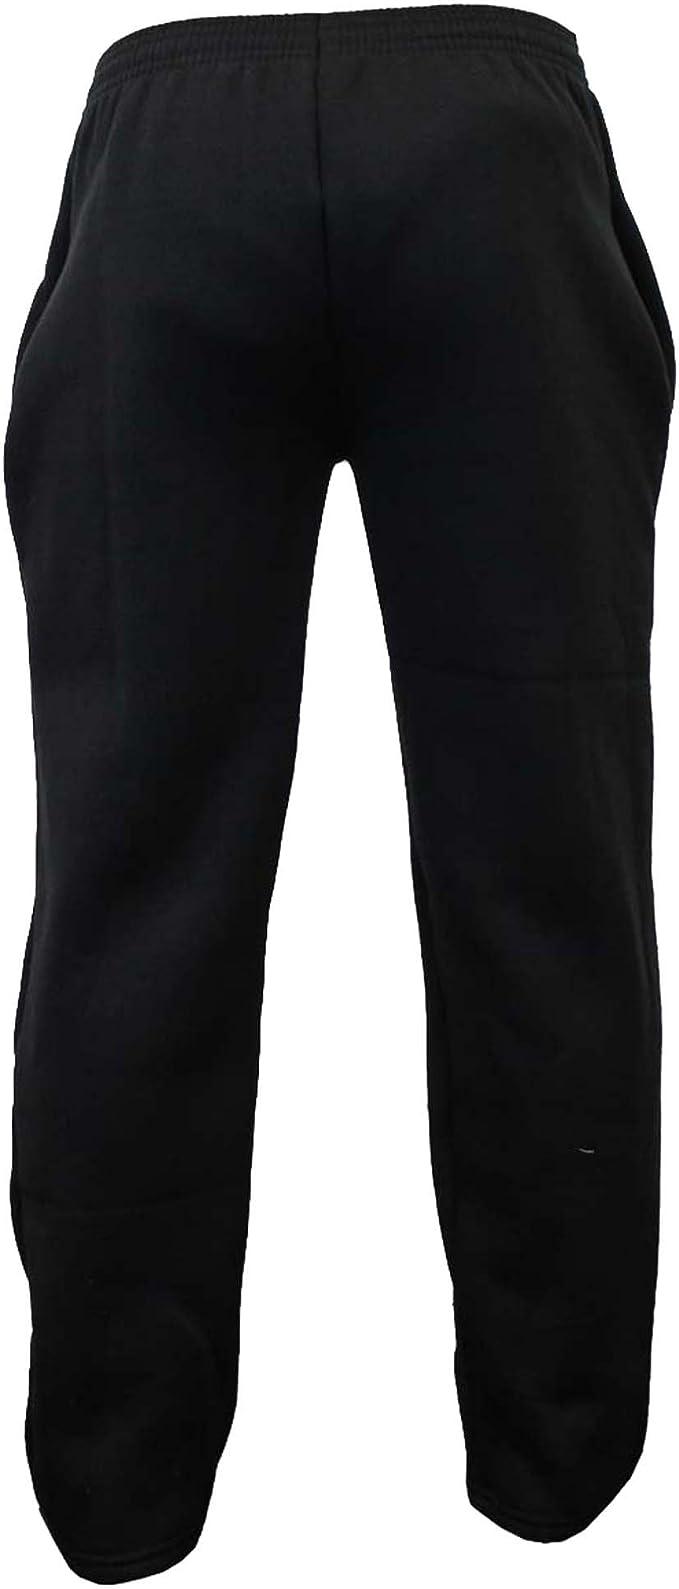 N//A Boys Bottoms Kids PE School Pants Tracksuit Fleece Lined Trousers Sports Casual